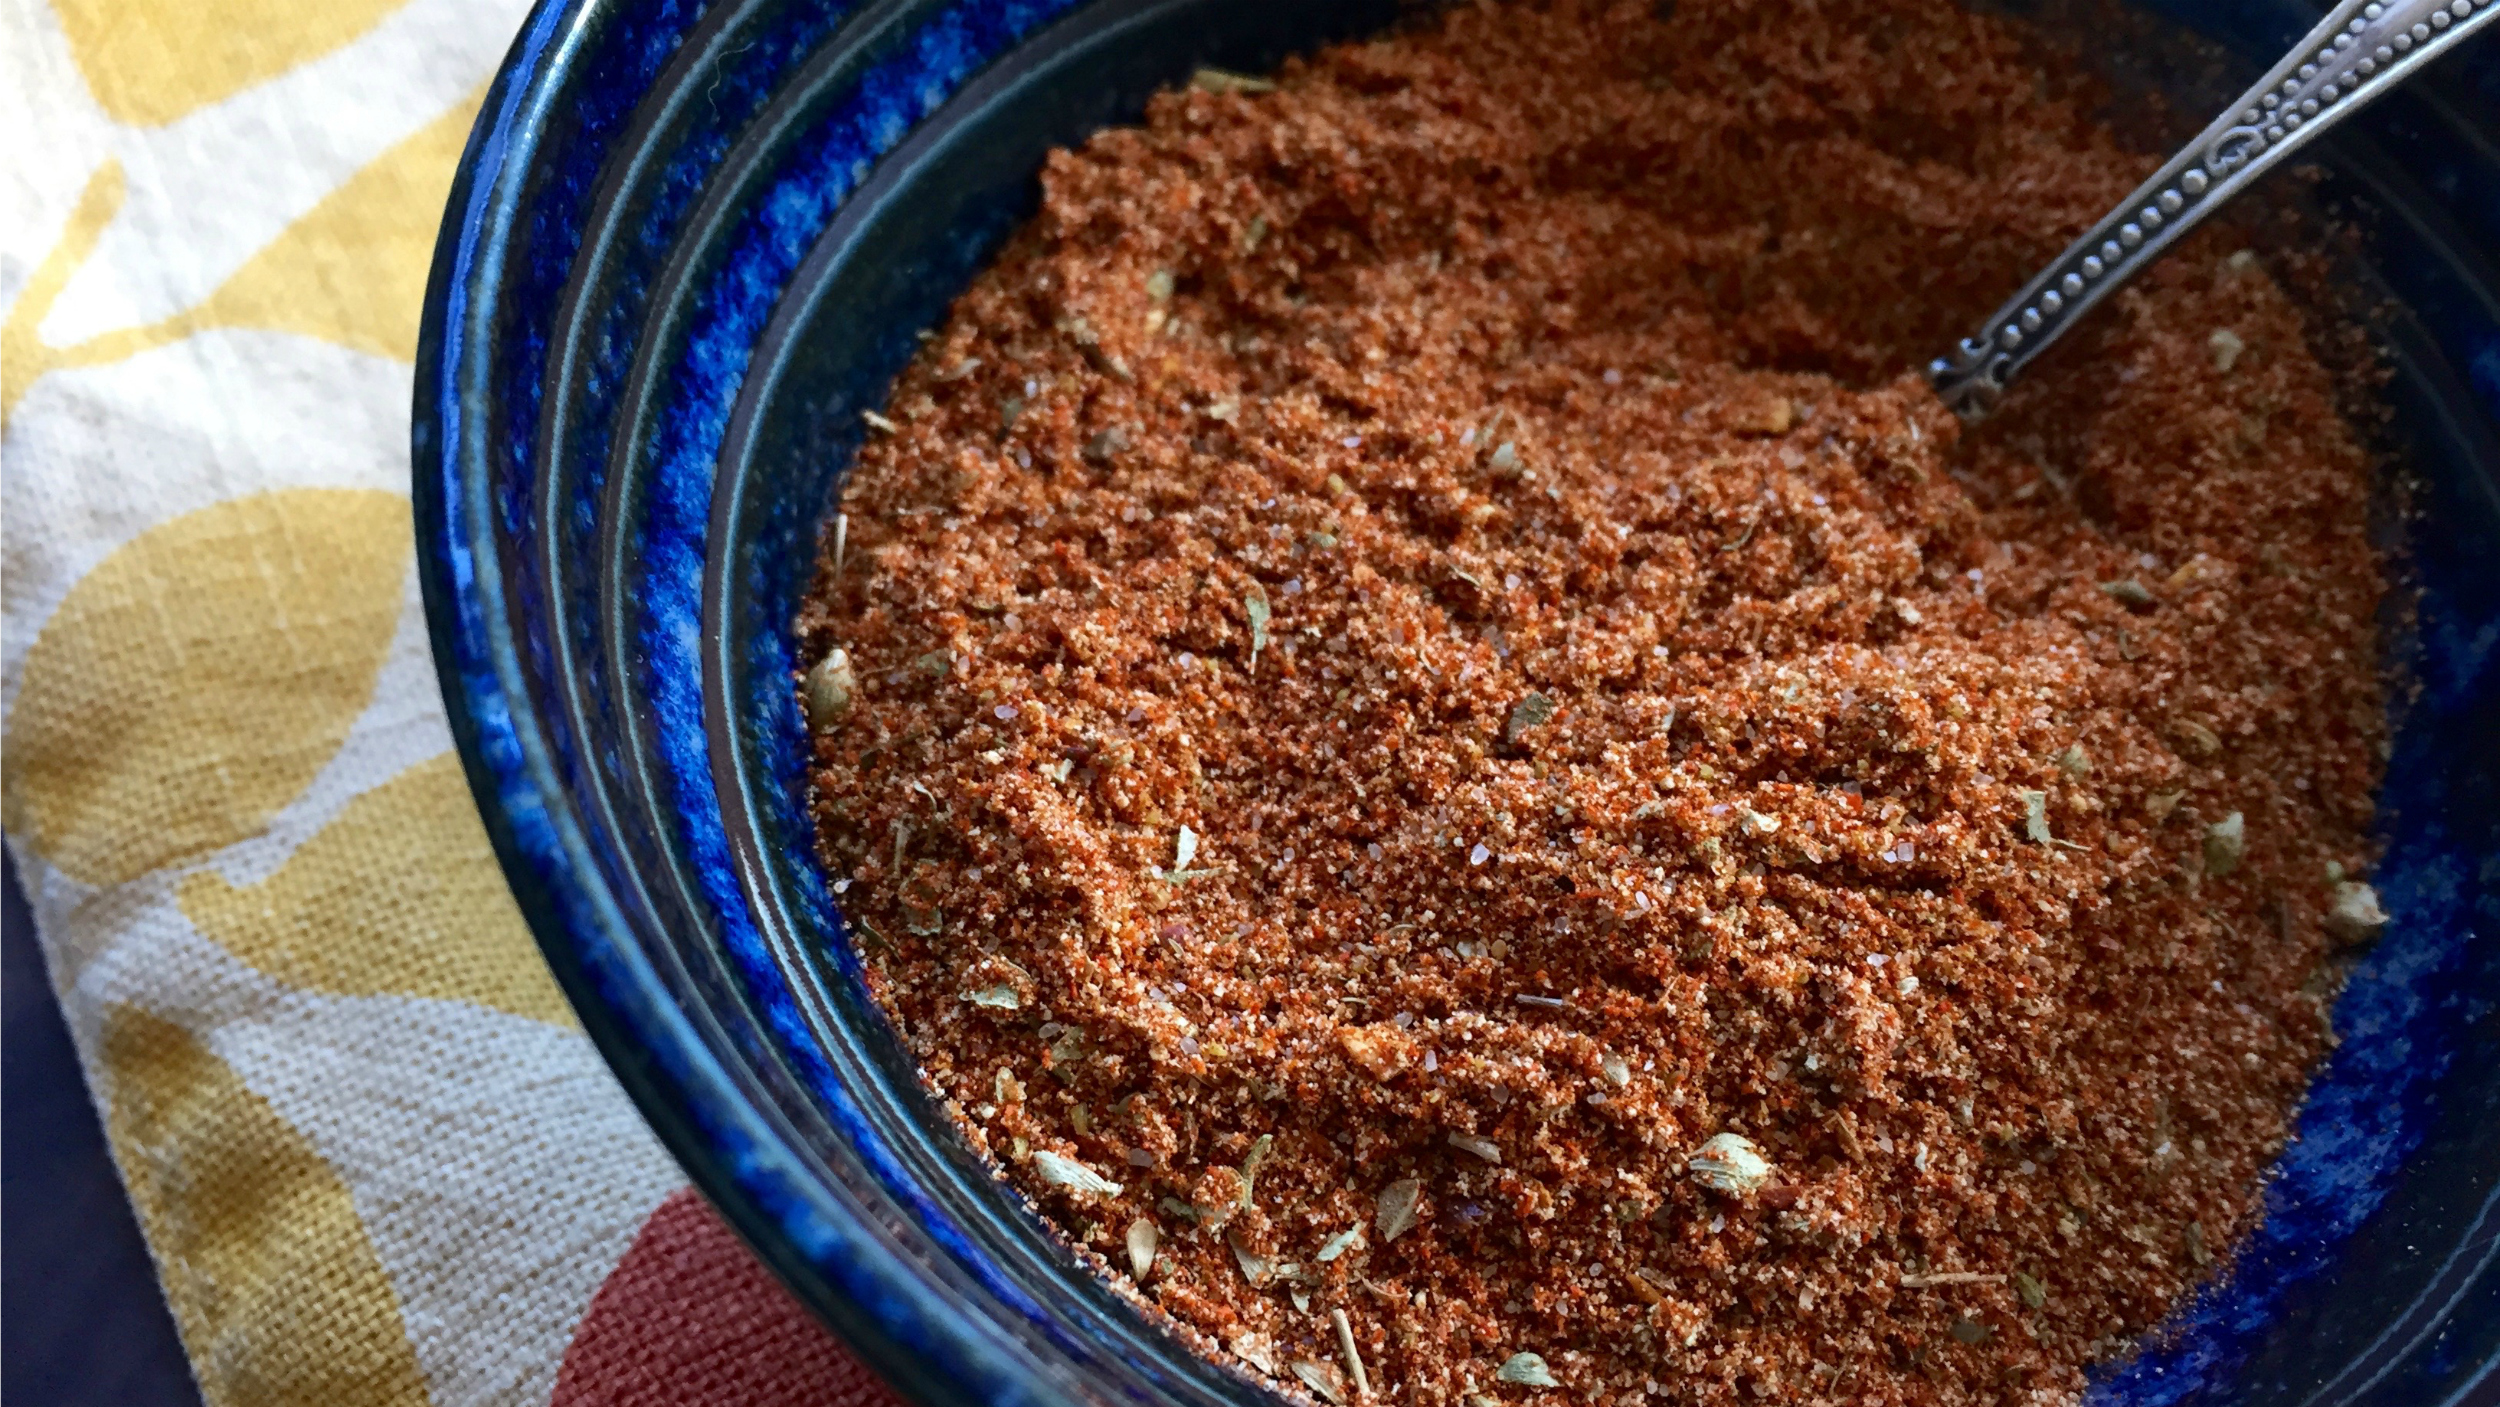 Taco and Chili Seasoning Mix - TODAY.com